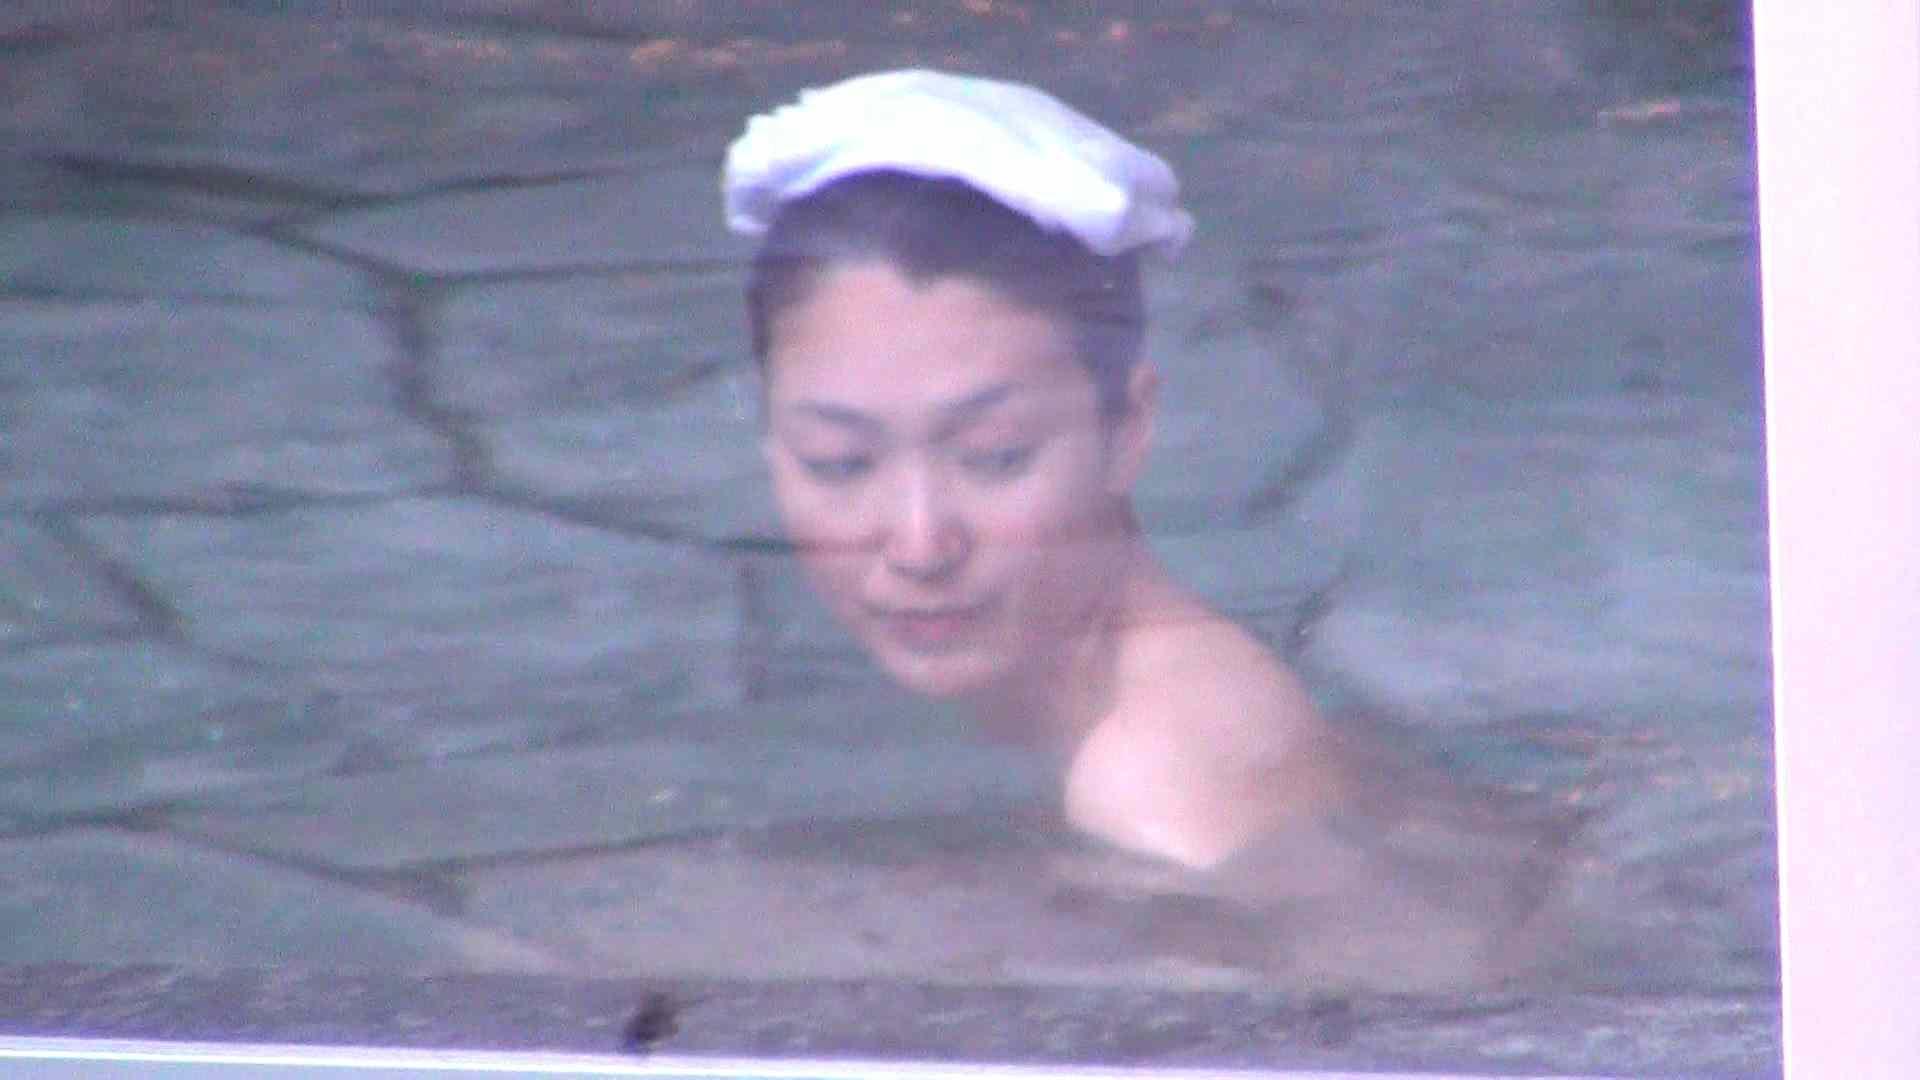 Aquaな露天風呂Vol.290 OL  109連発 35